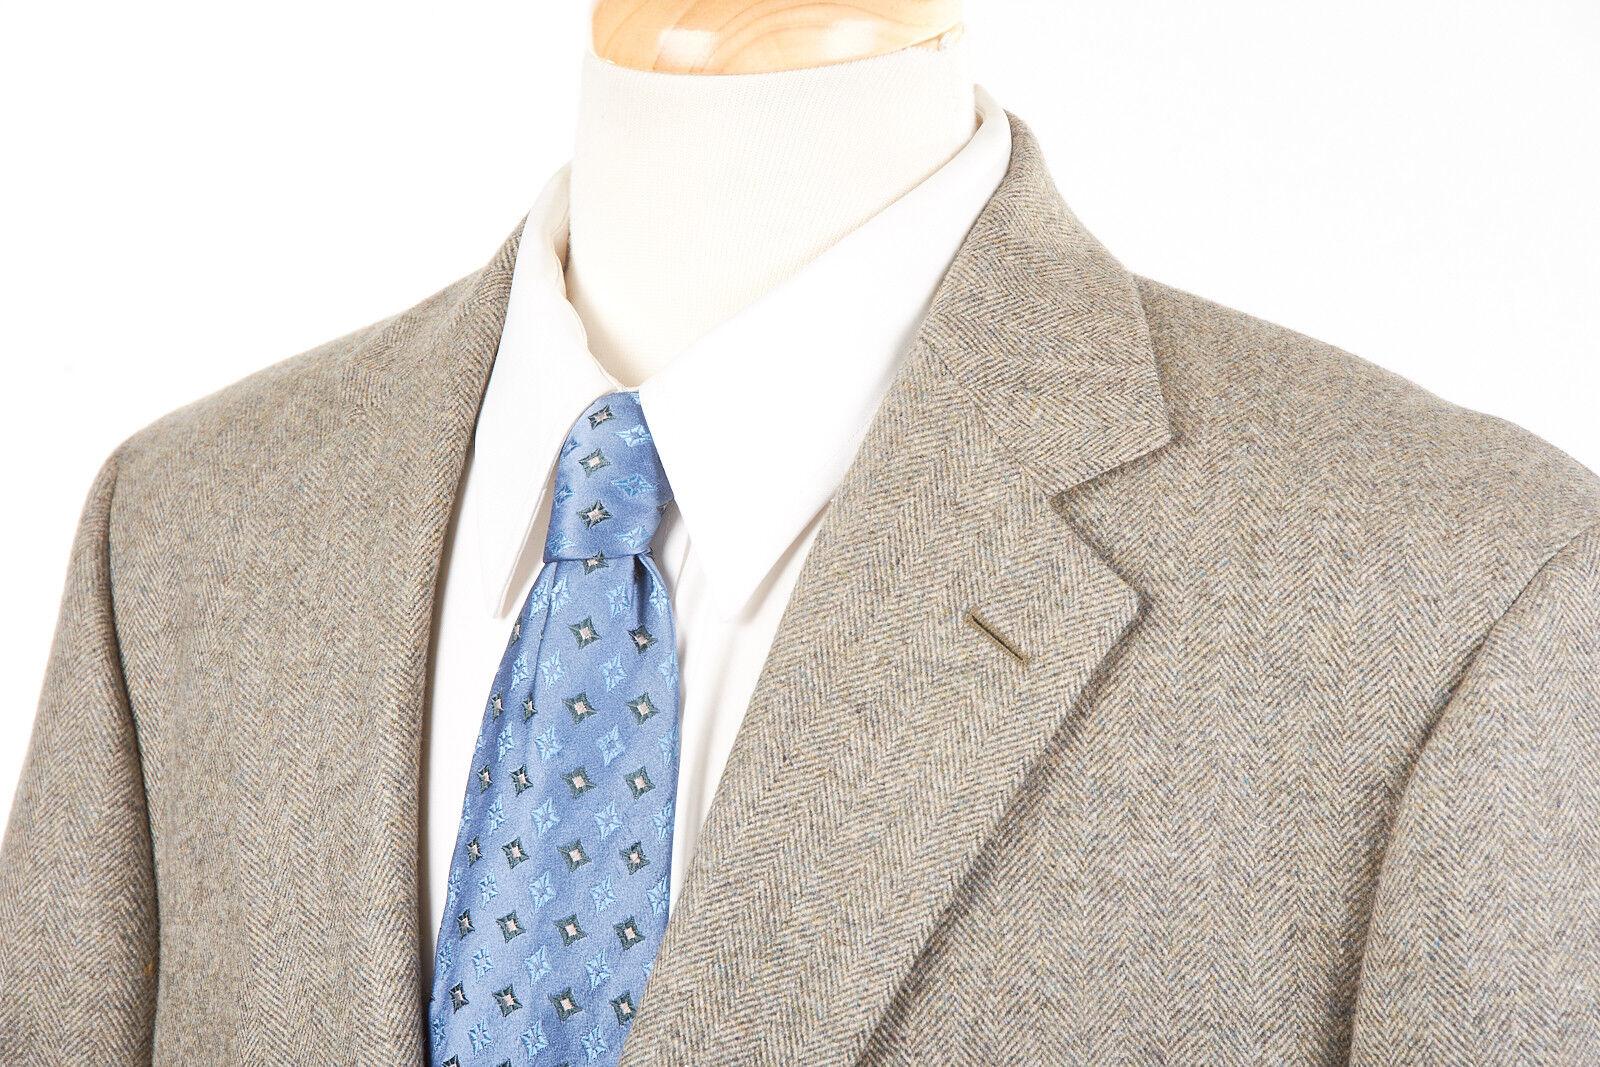 Uomo ANDOVER SHOP Sport marrone Coat 44 L in Cinnamon marrone Sport Herringbone Wool Tweed dd1c5e